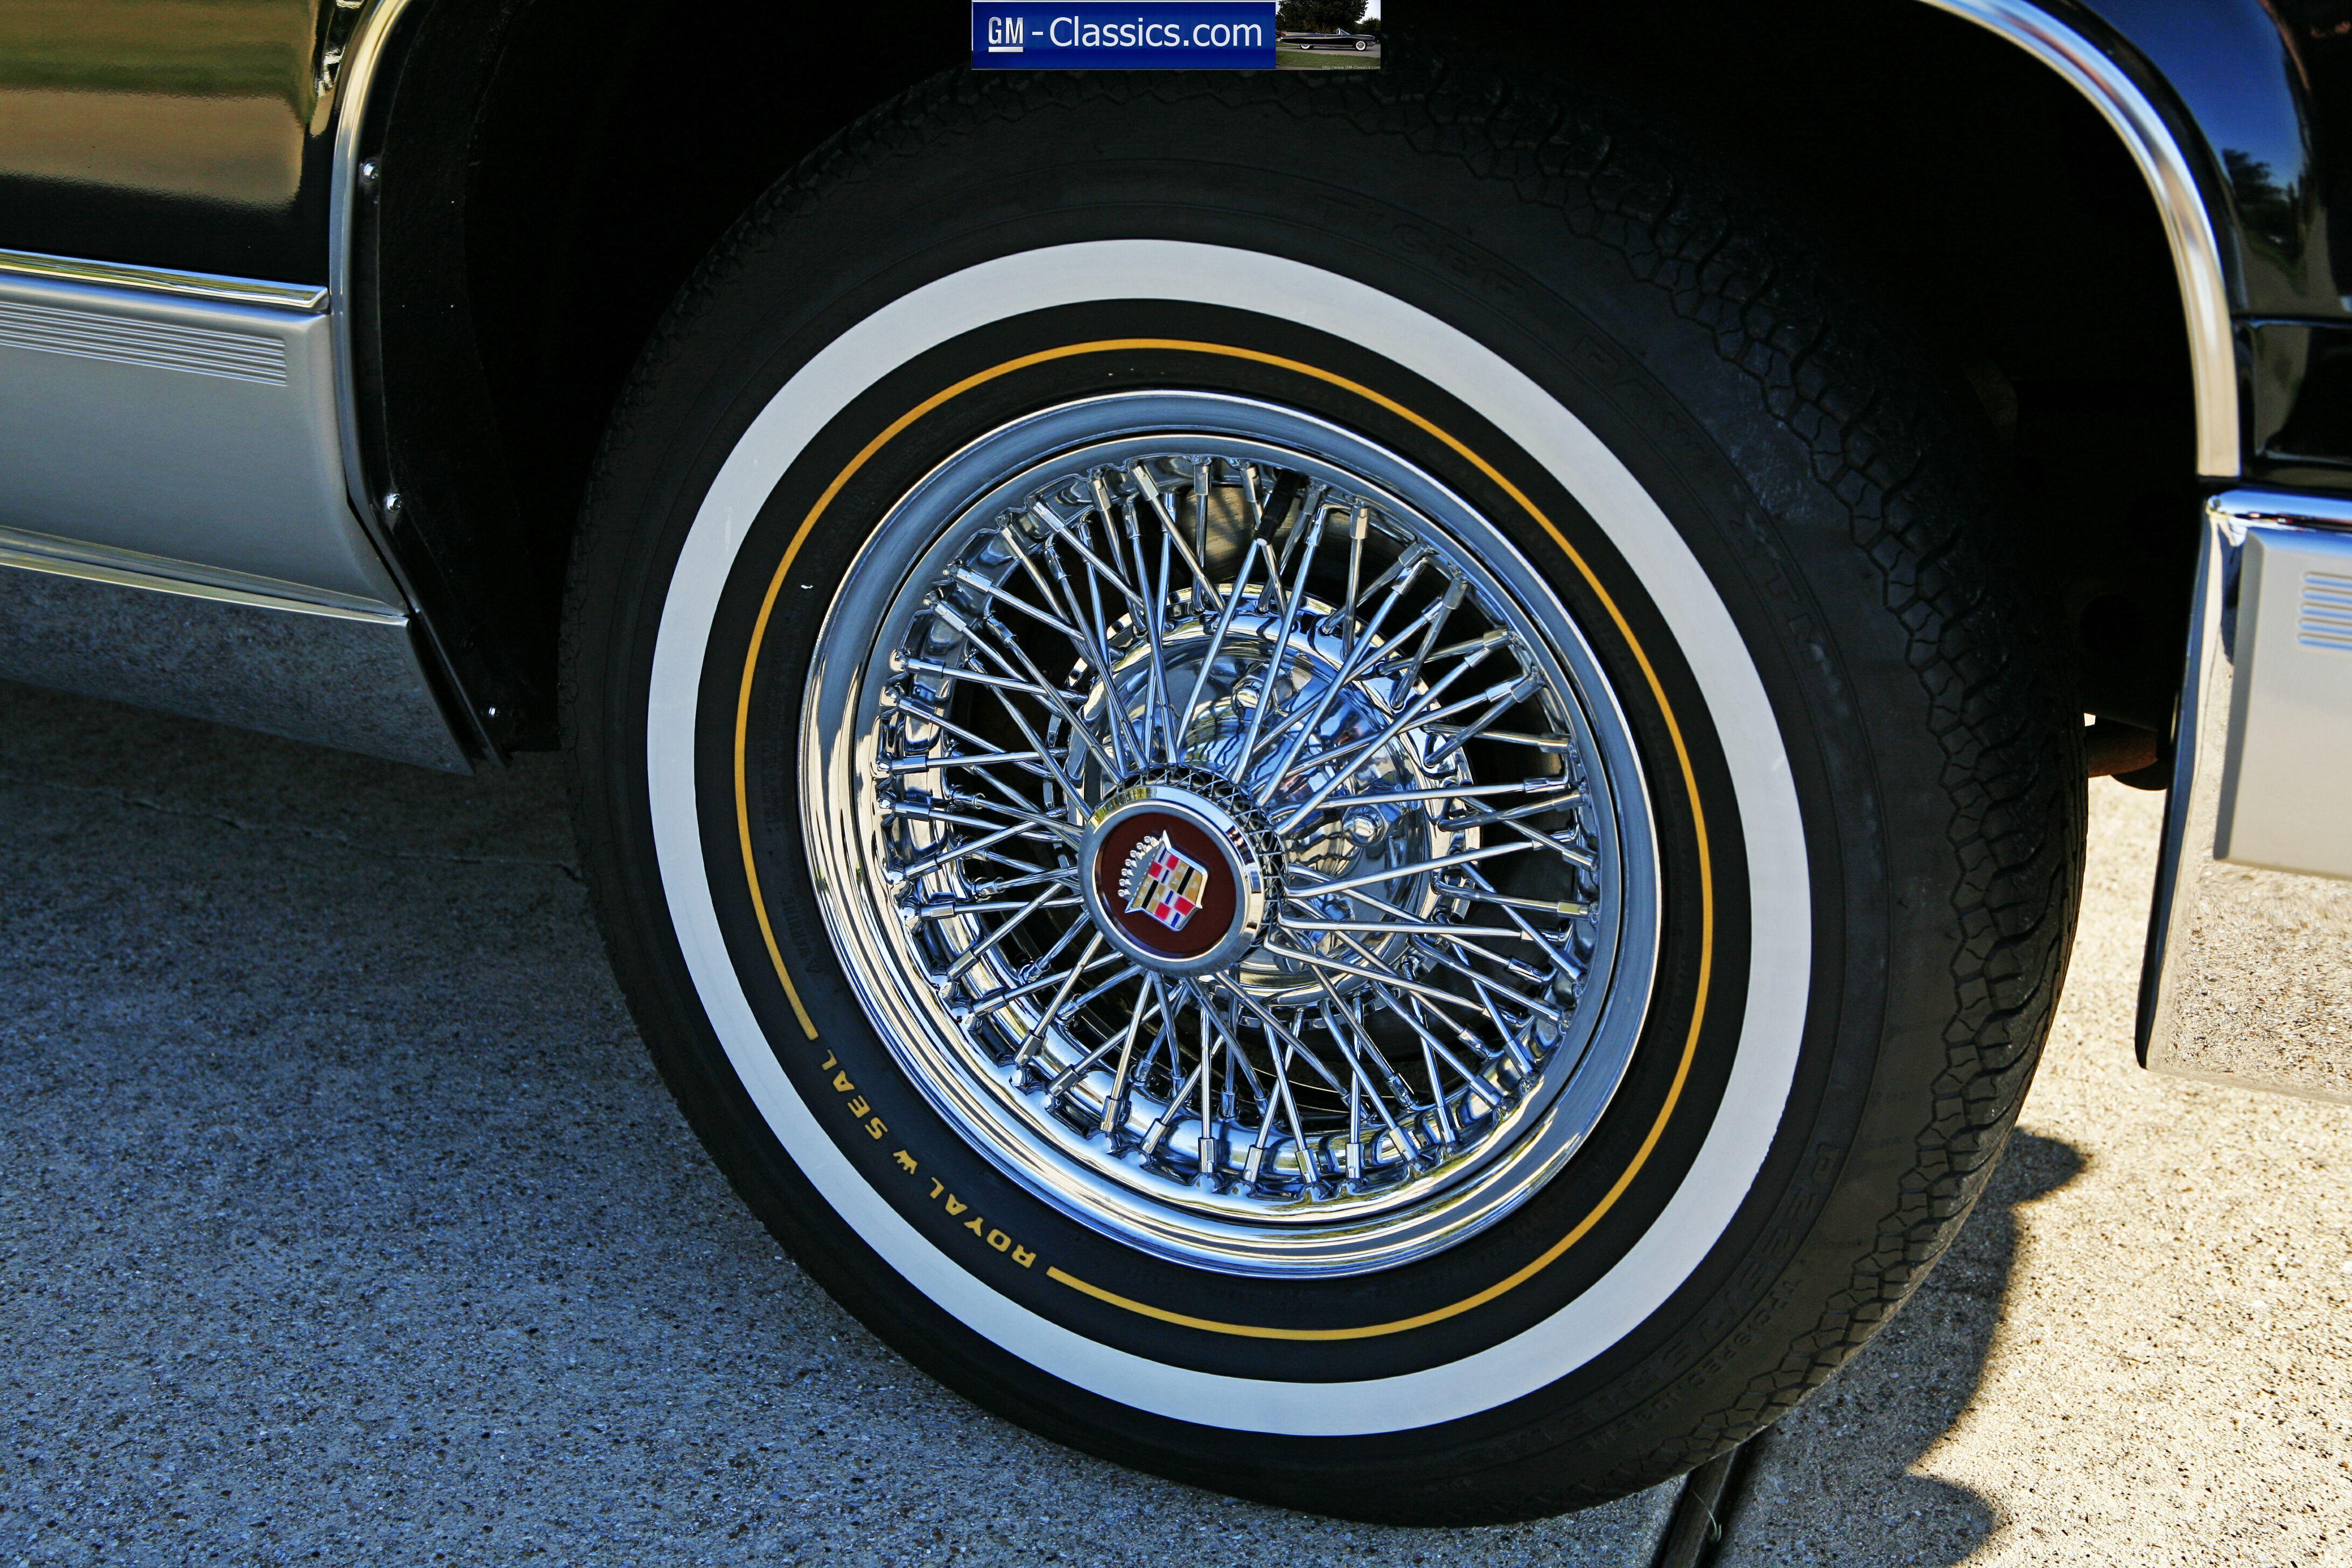 Pin by jolira7 . on Cadillac Real Wire Wheels | Pinterest | Cadillac ...